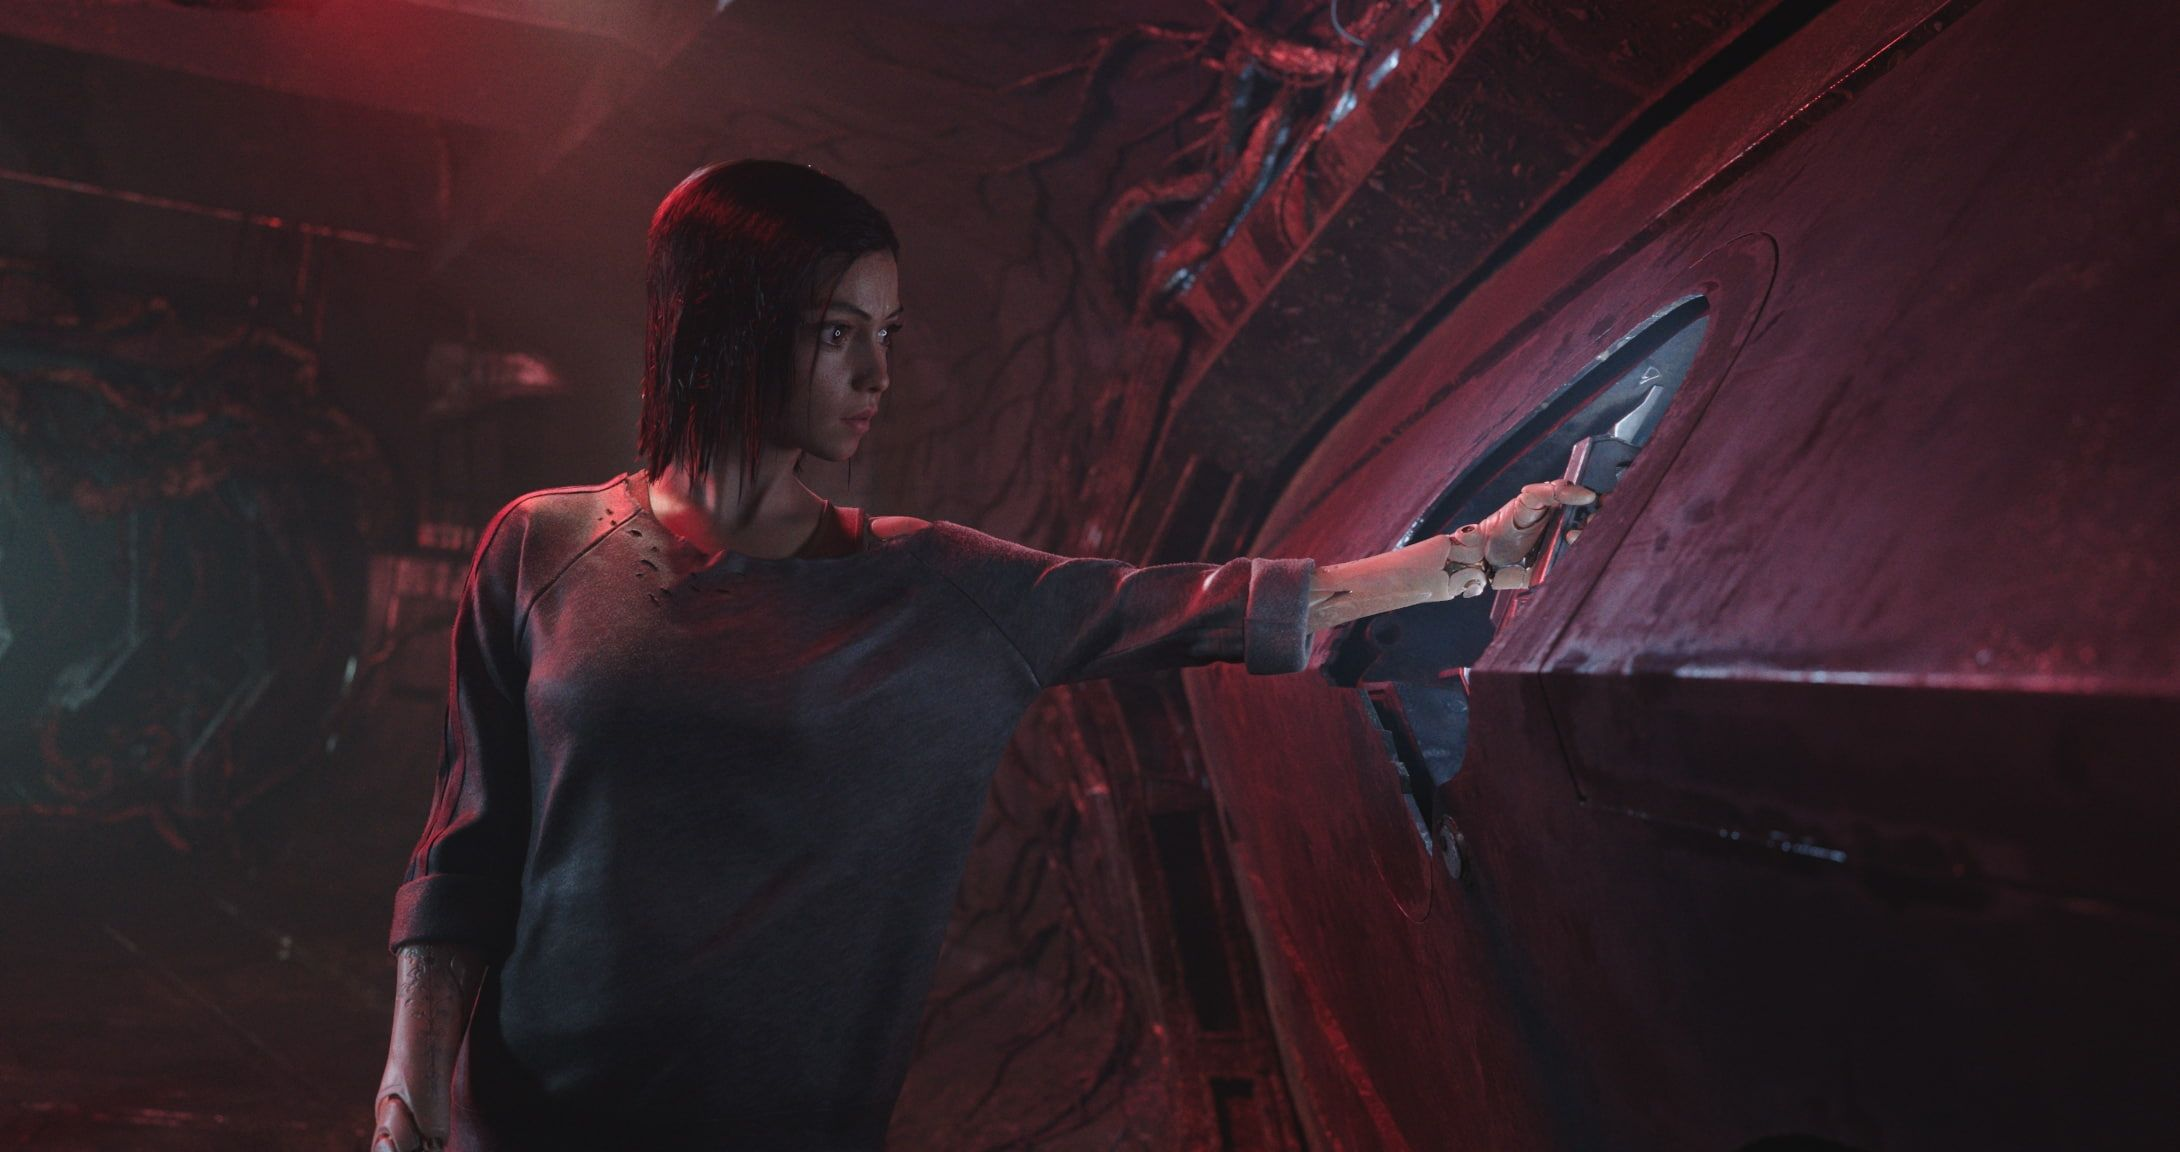 HD wallpaper: Alita: Battle Angel, Rosa Salazar, movies, women, actress, cyborg